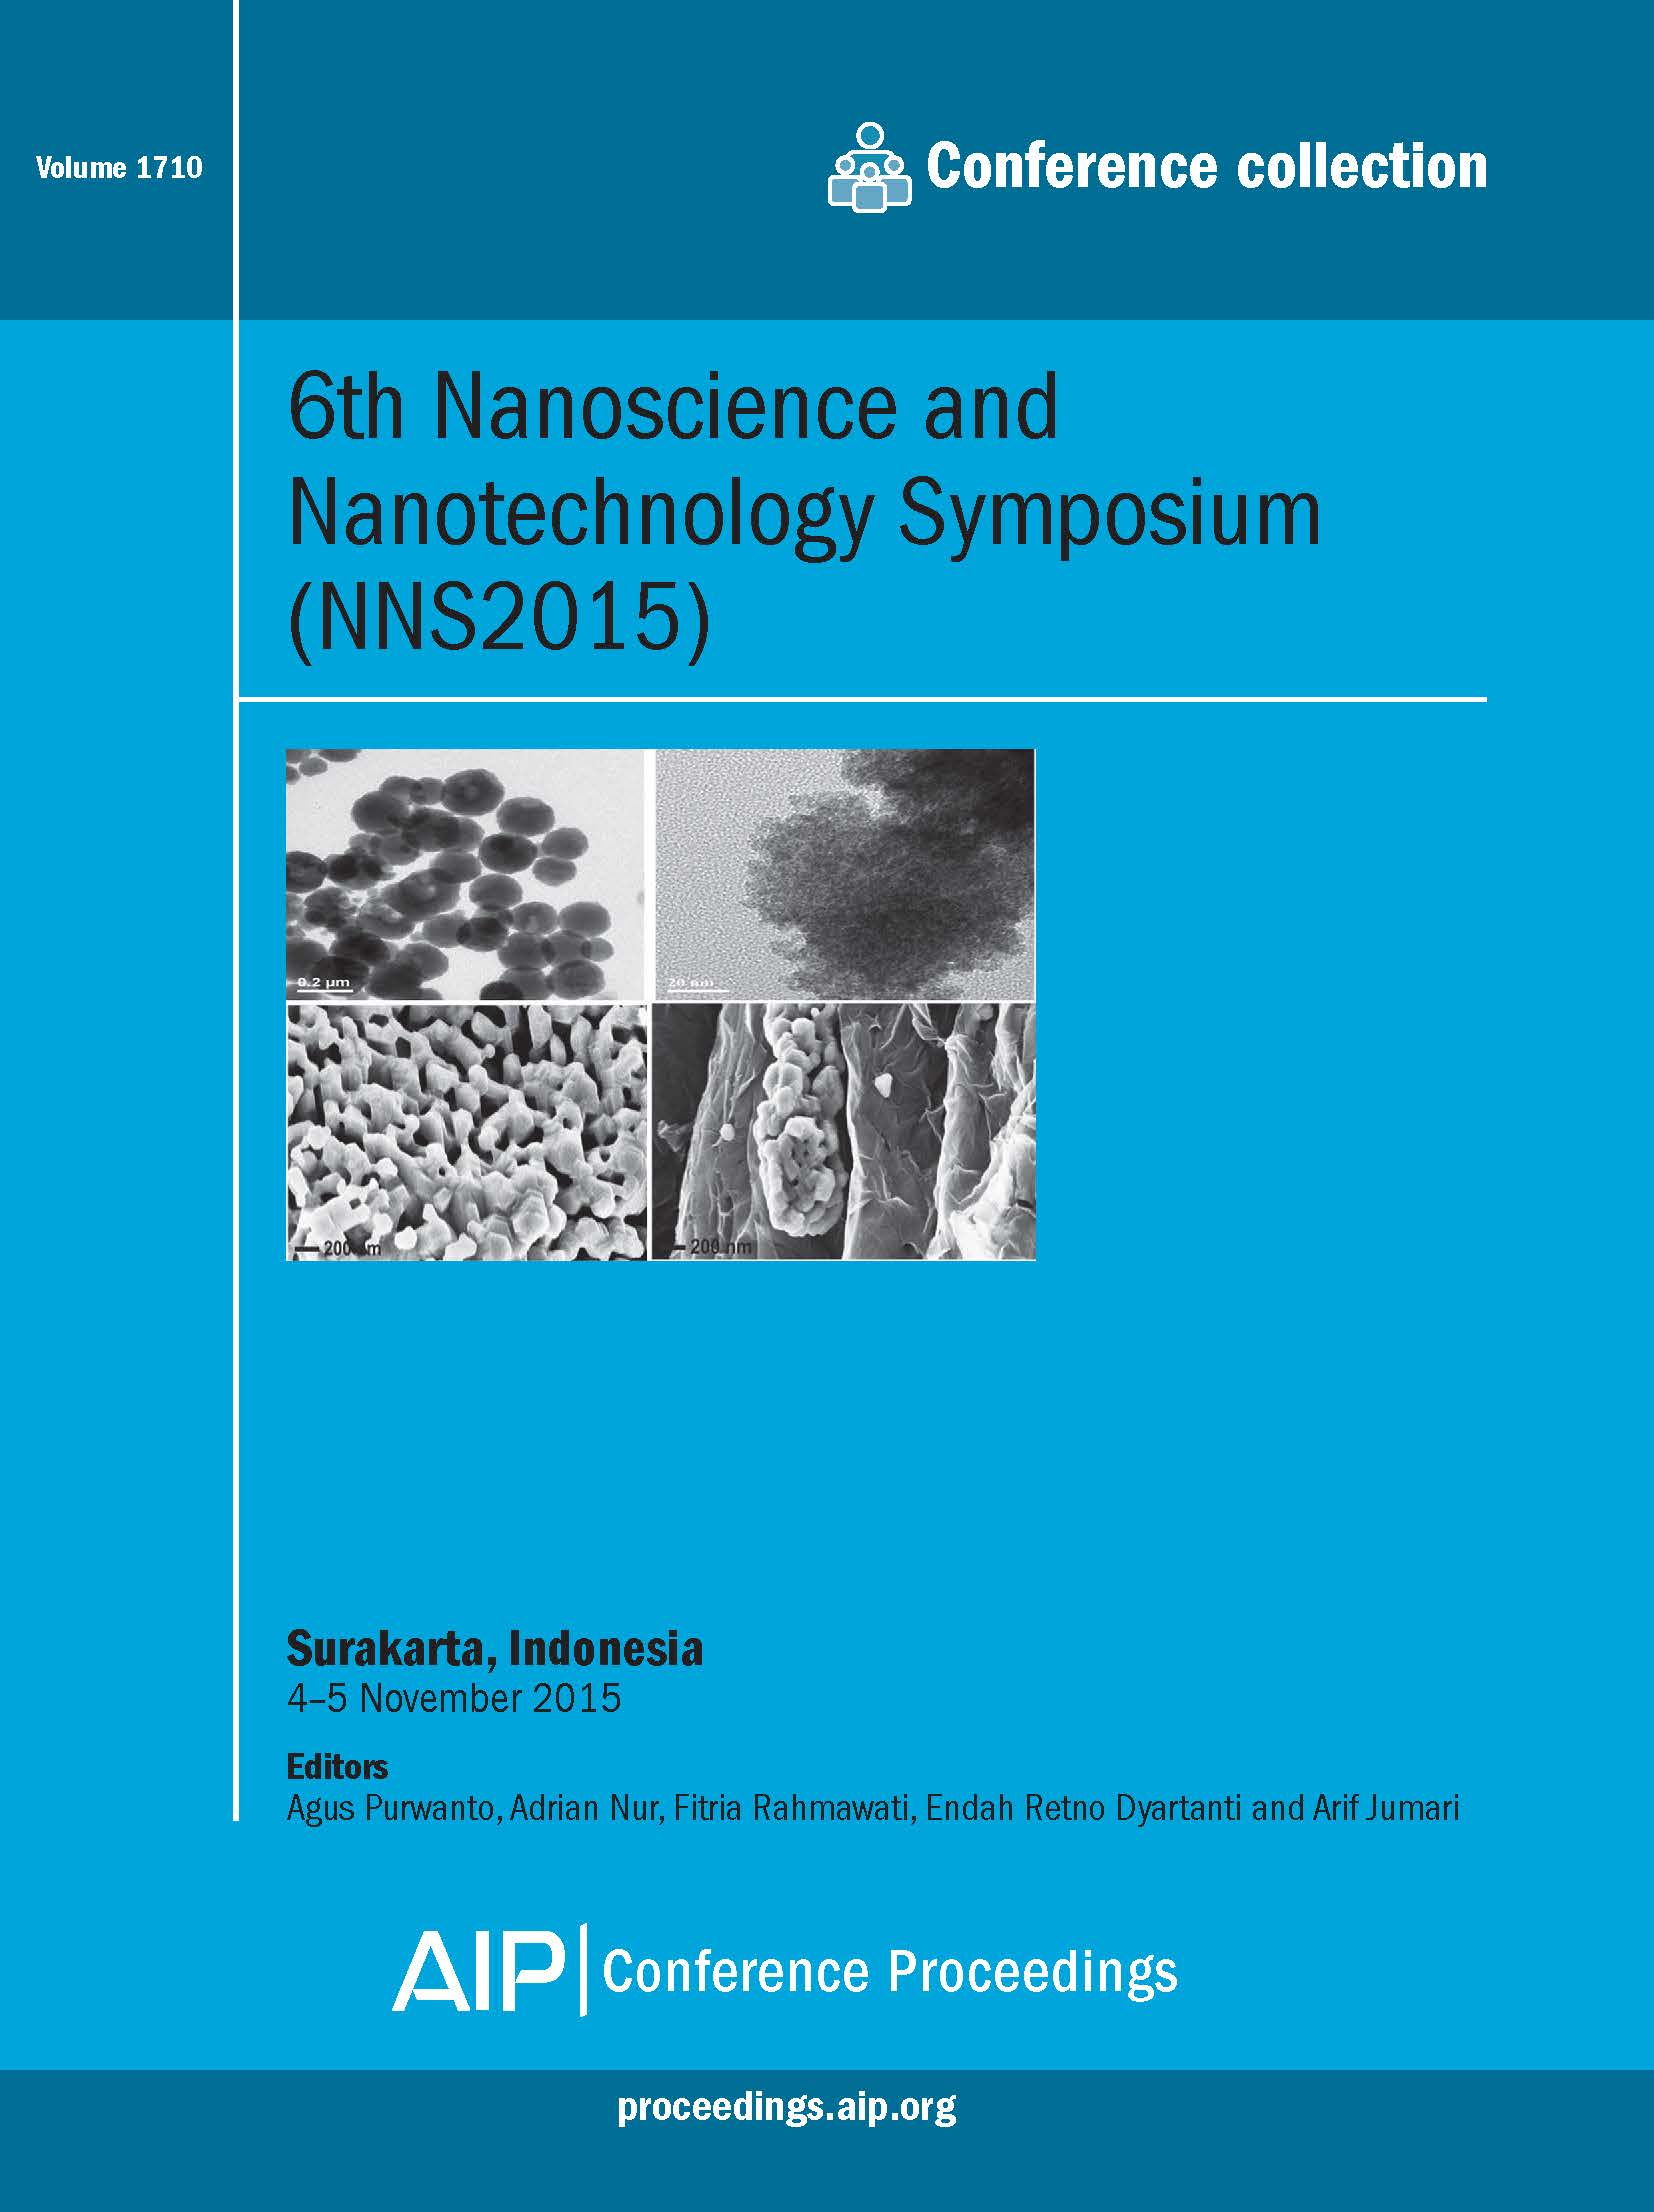 Volume 1710: 6th Nanoscience and Nanotechnology Symposium